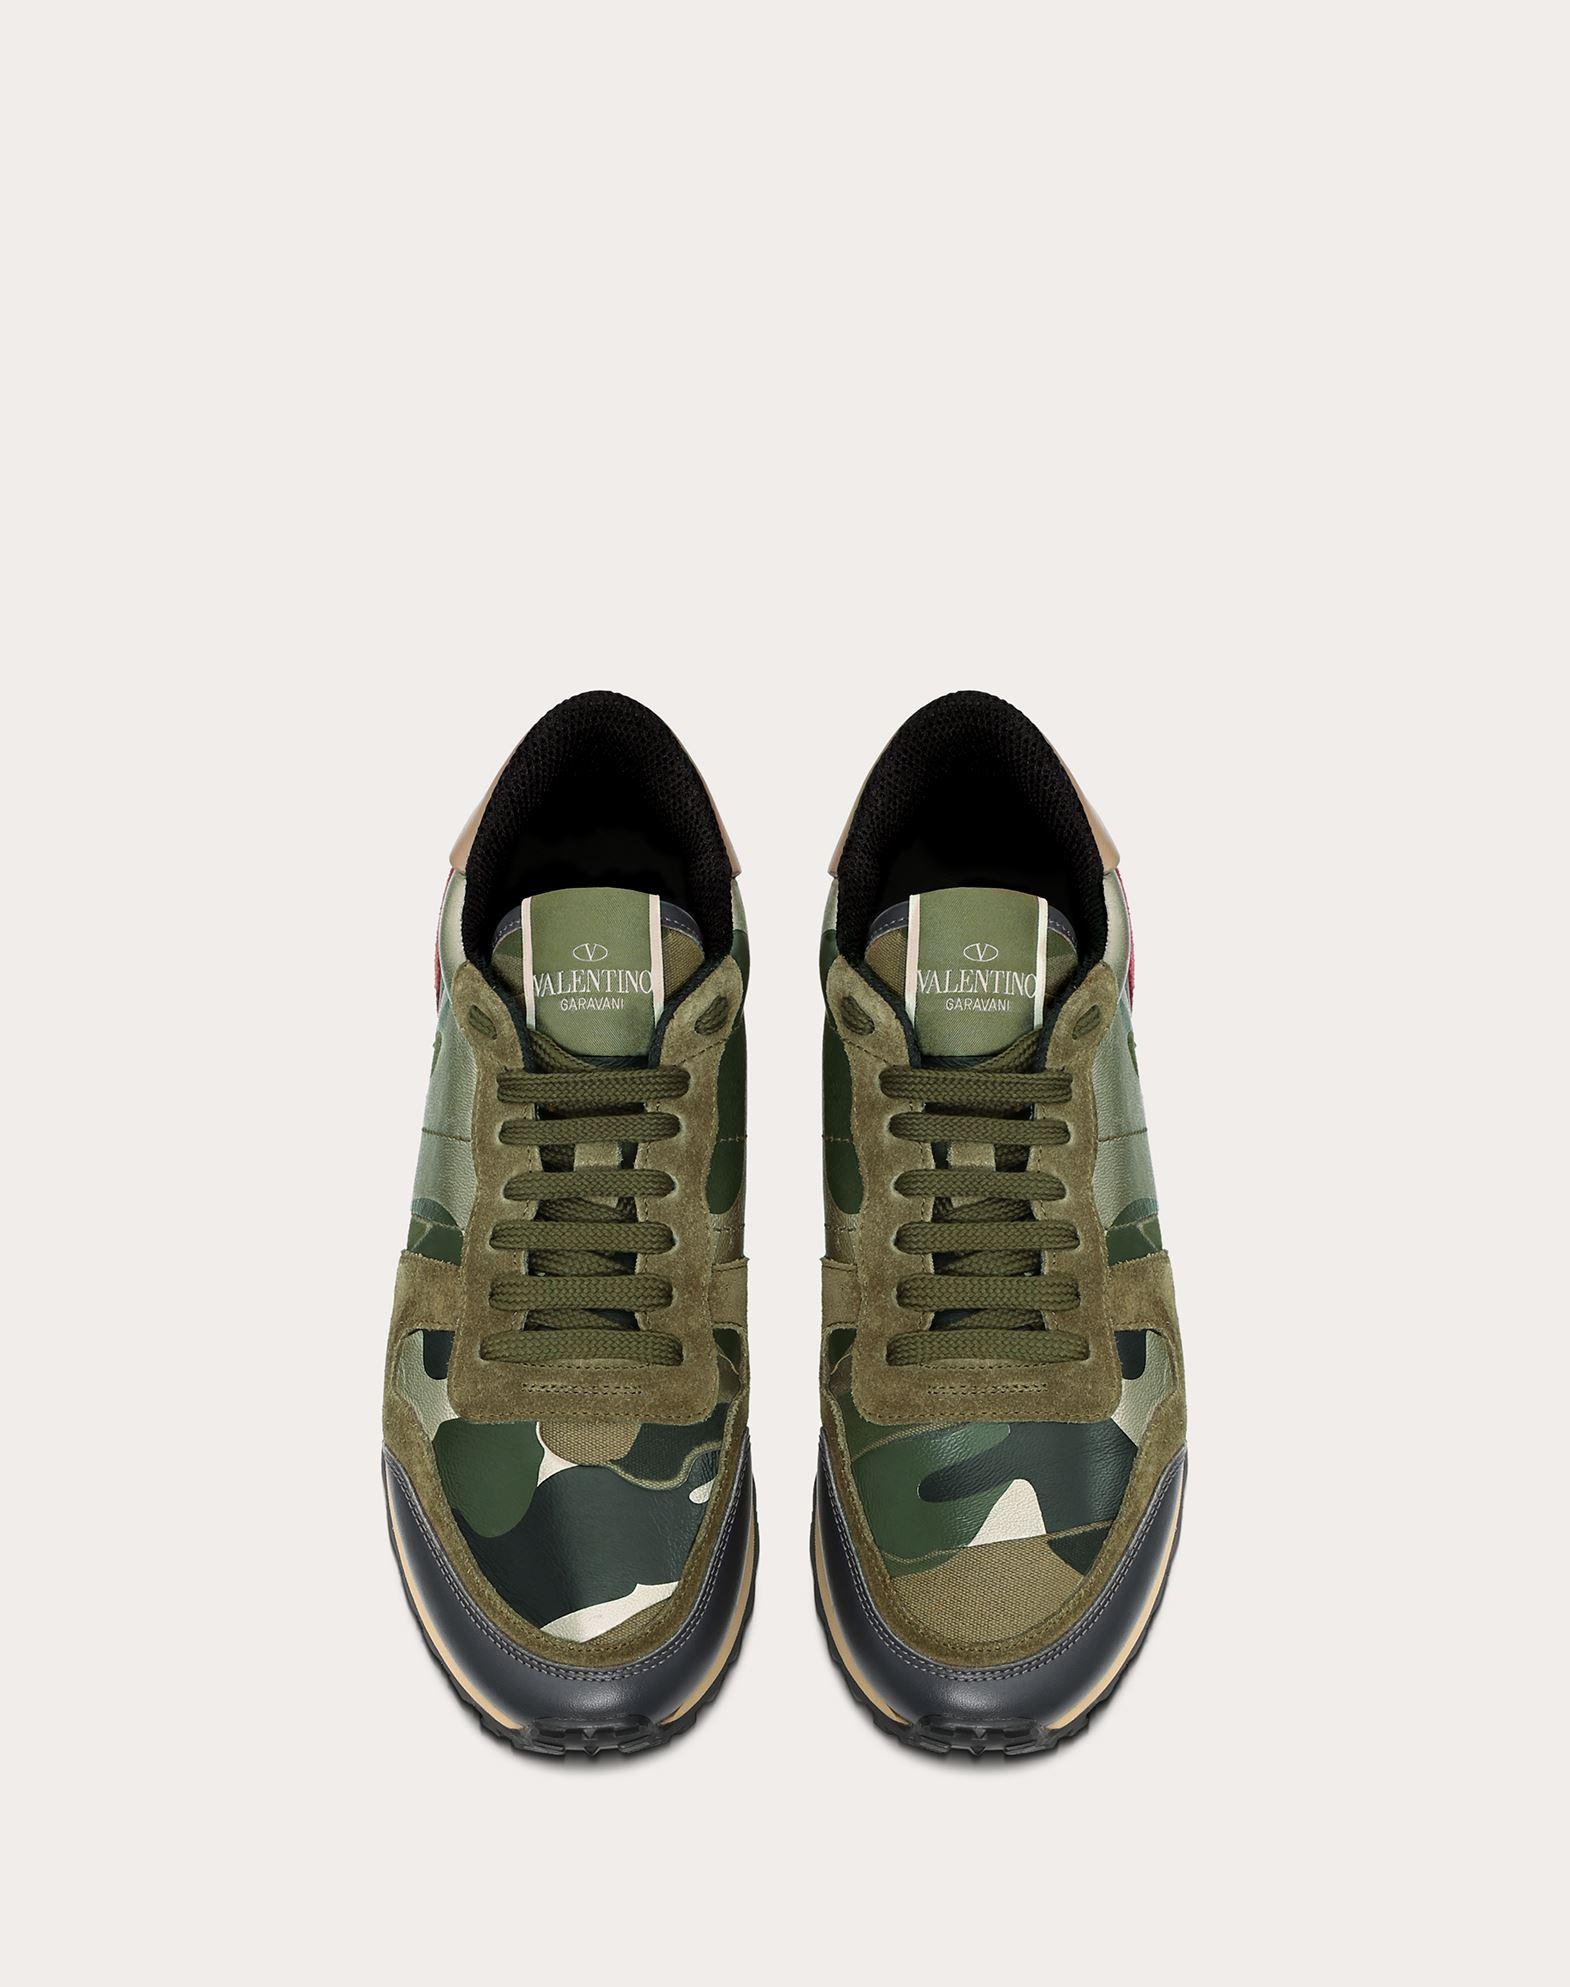 VALENTINO GARAVANI Camouflage sneaker LOW-TOP SNEAKERS D e